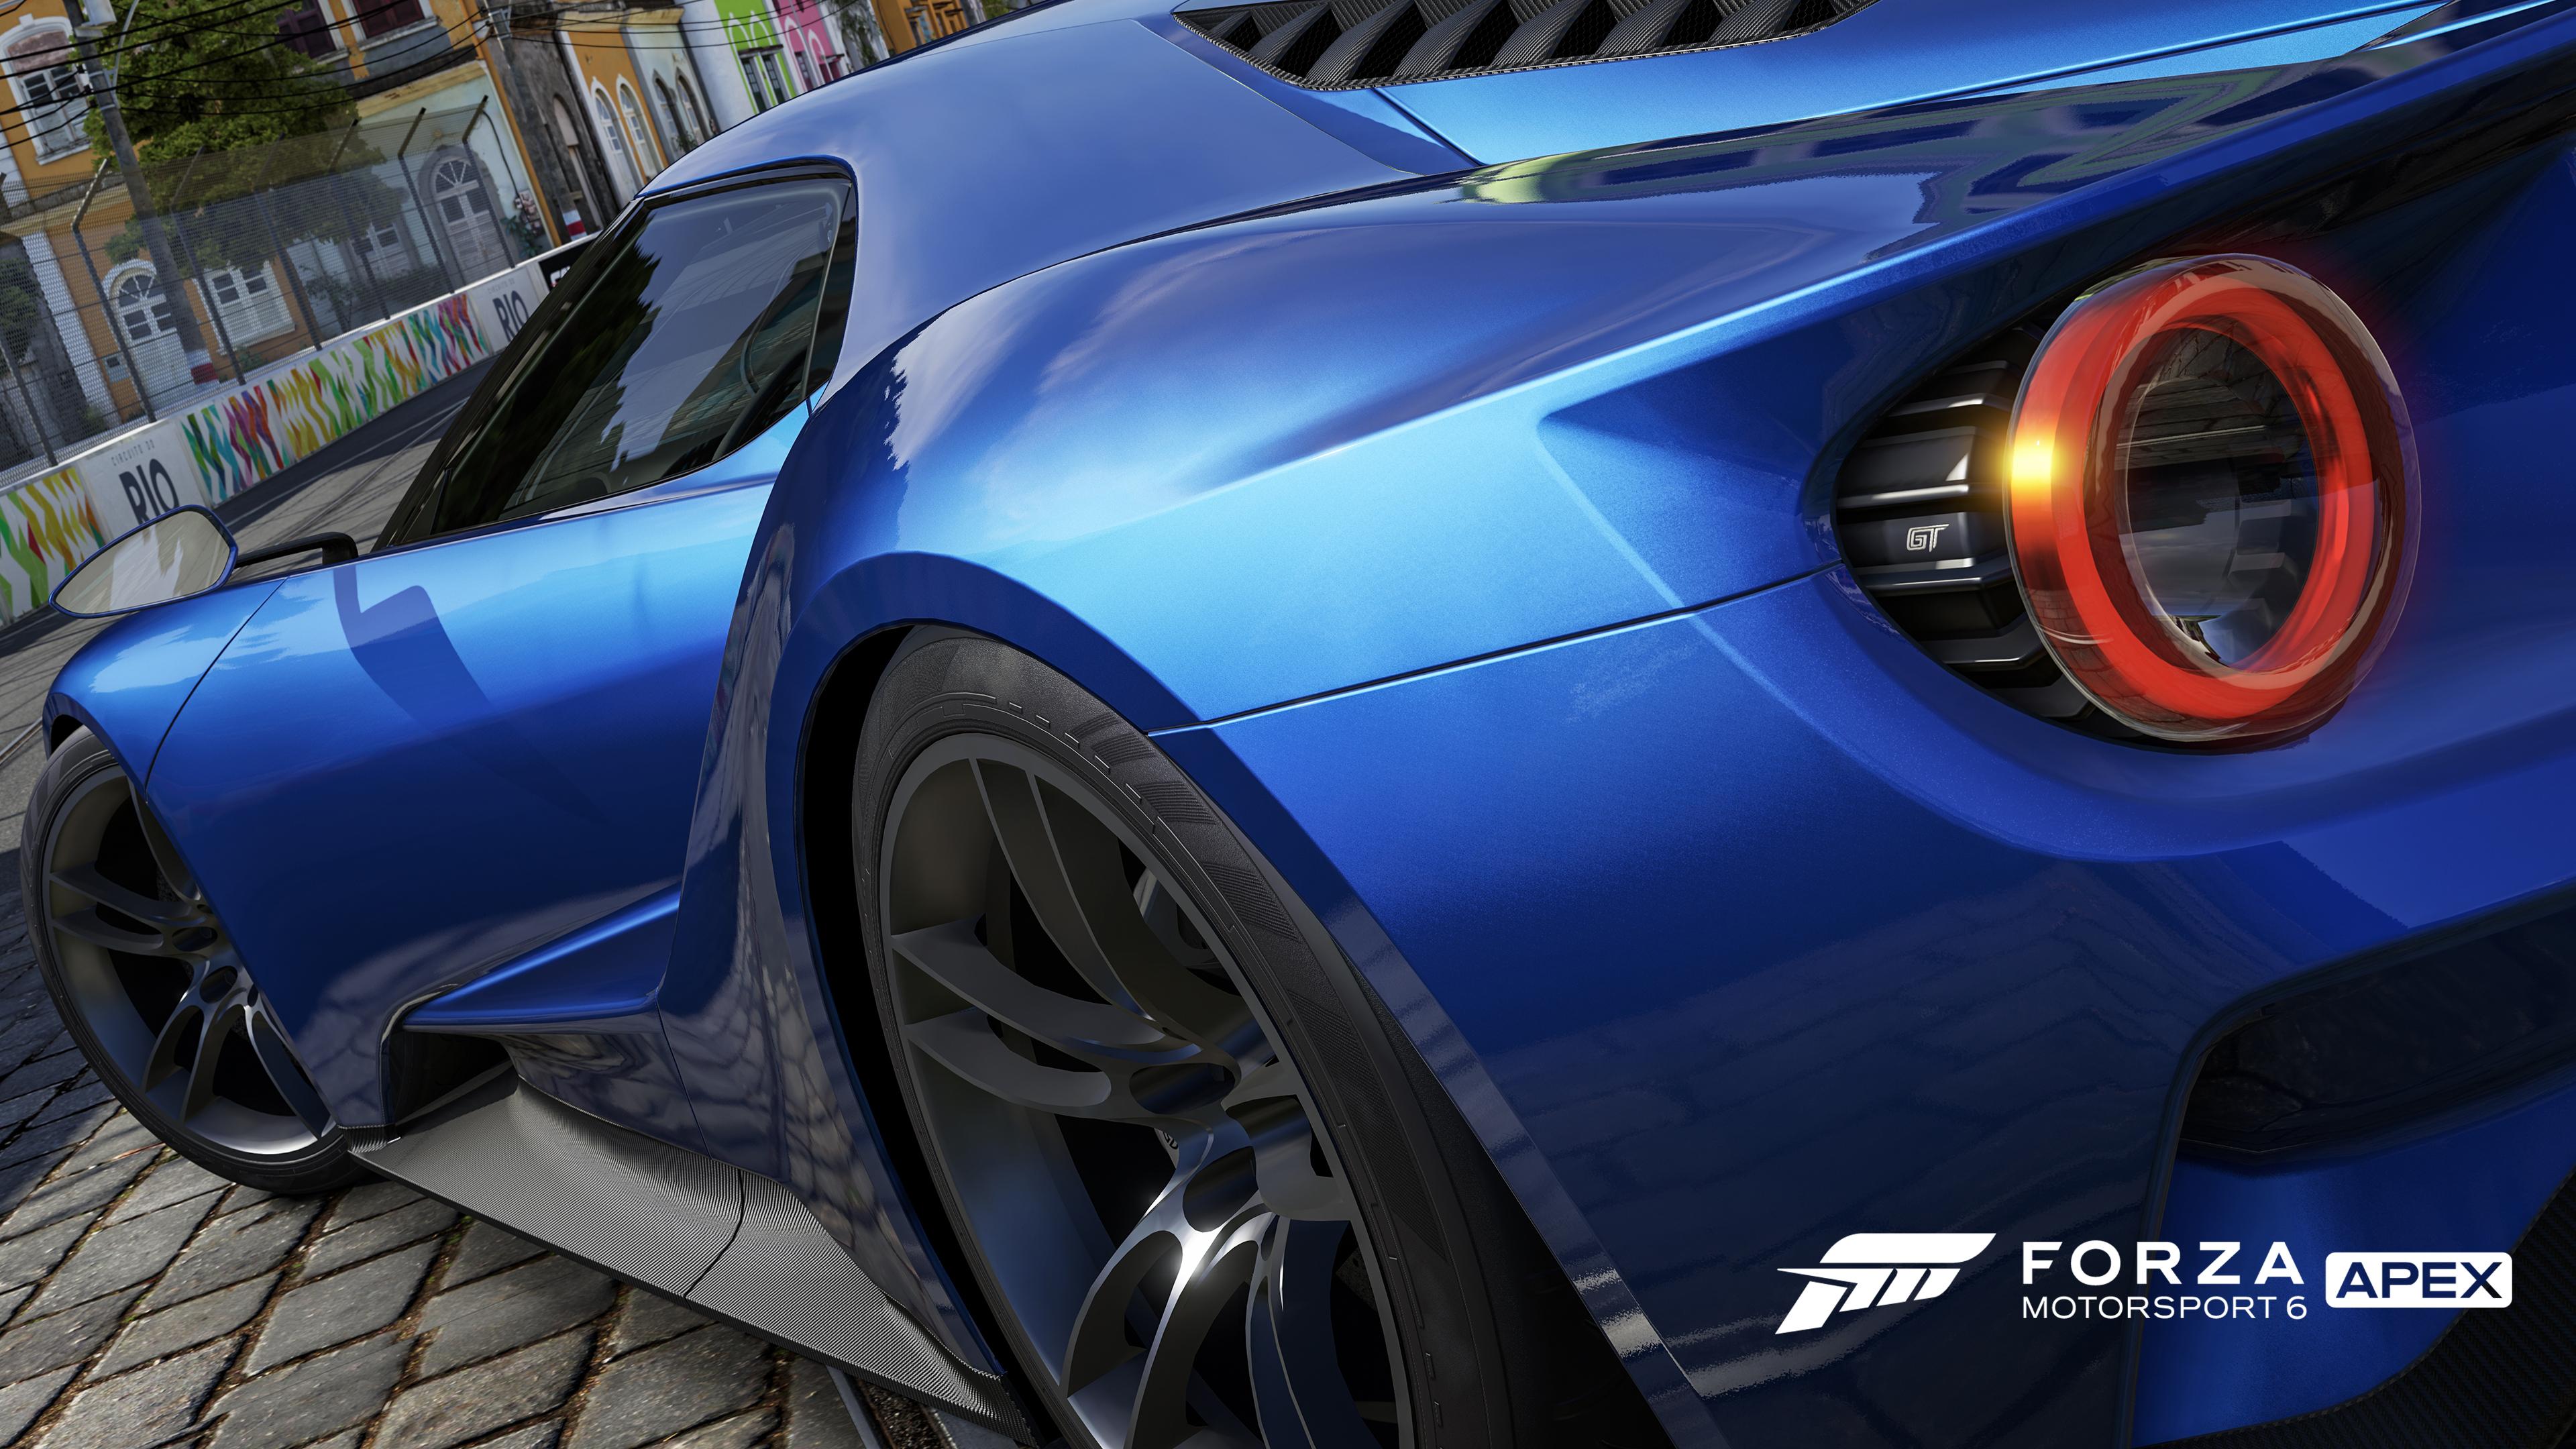 How to fix error code 0x80240438 on Forza Motorsport 6: Apex?